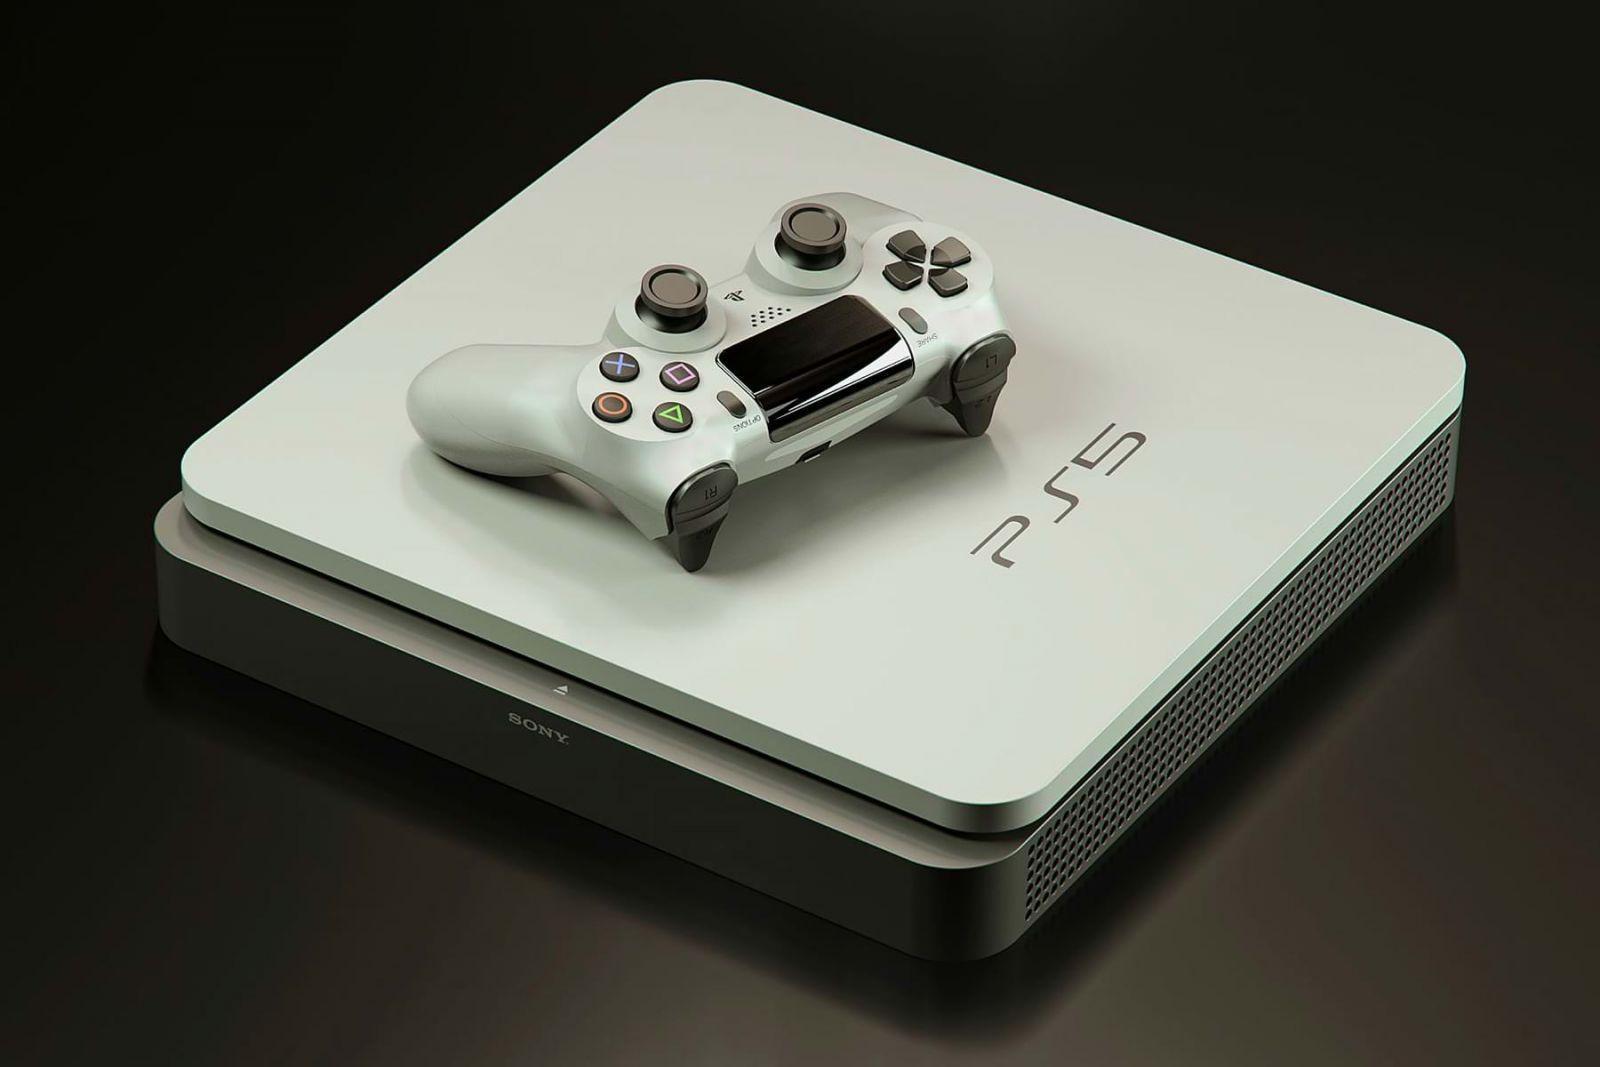 Sony объявила подробные характеристики PlayStation 5 (sony playstation 5 00)